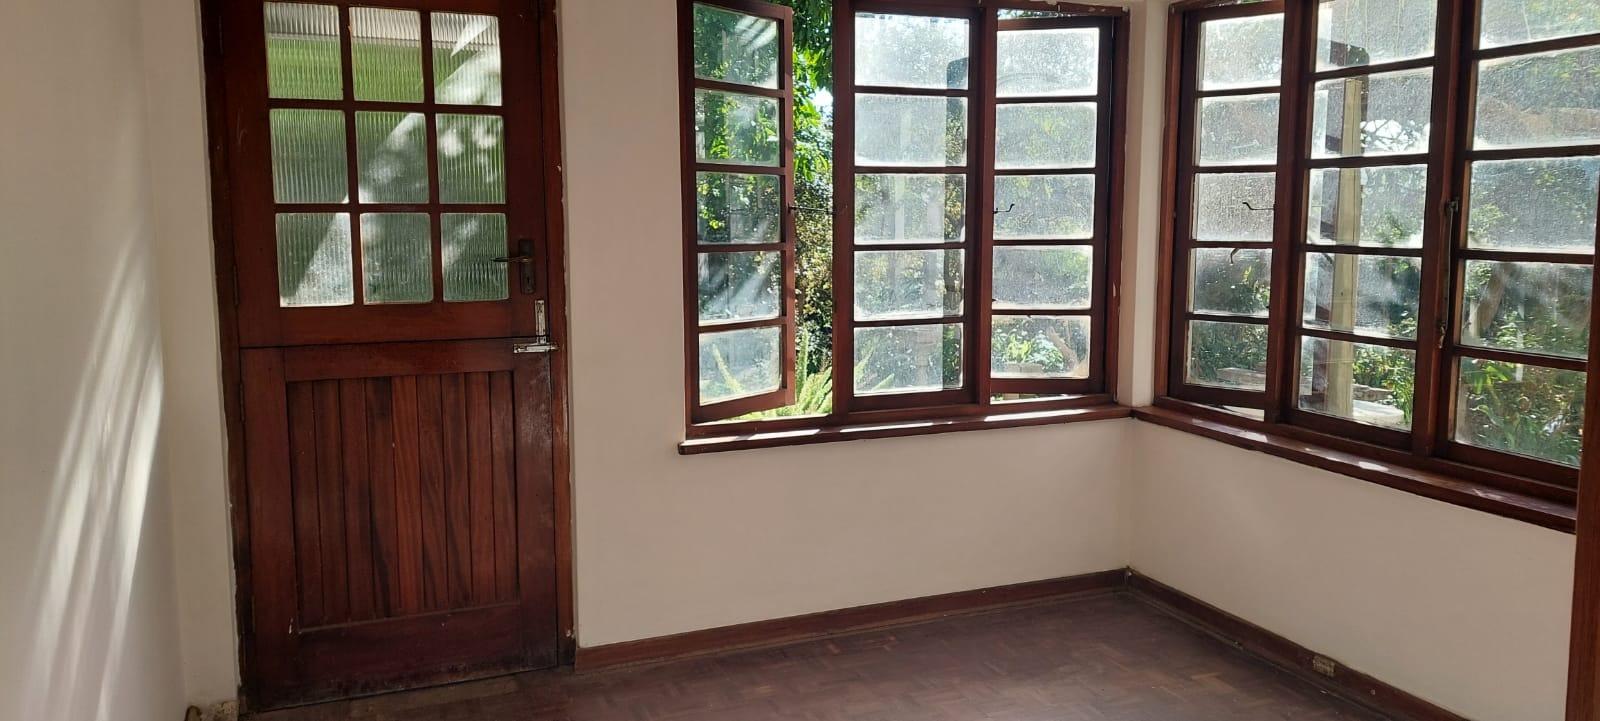 1 Bedroom Apartment / Flat To Rent in Amanzimtoti